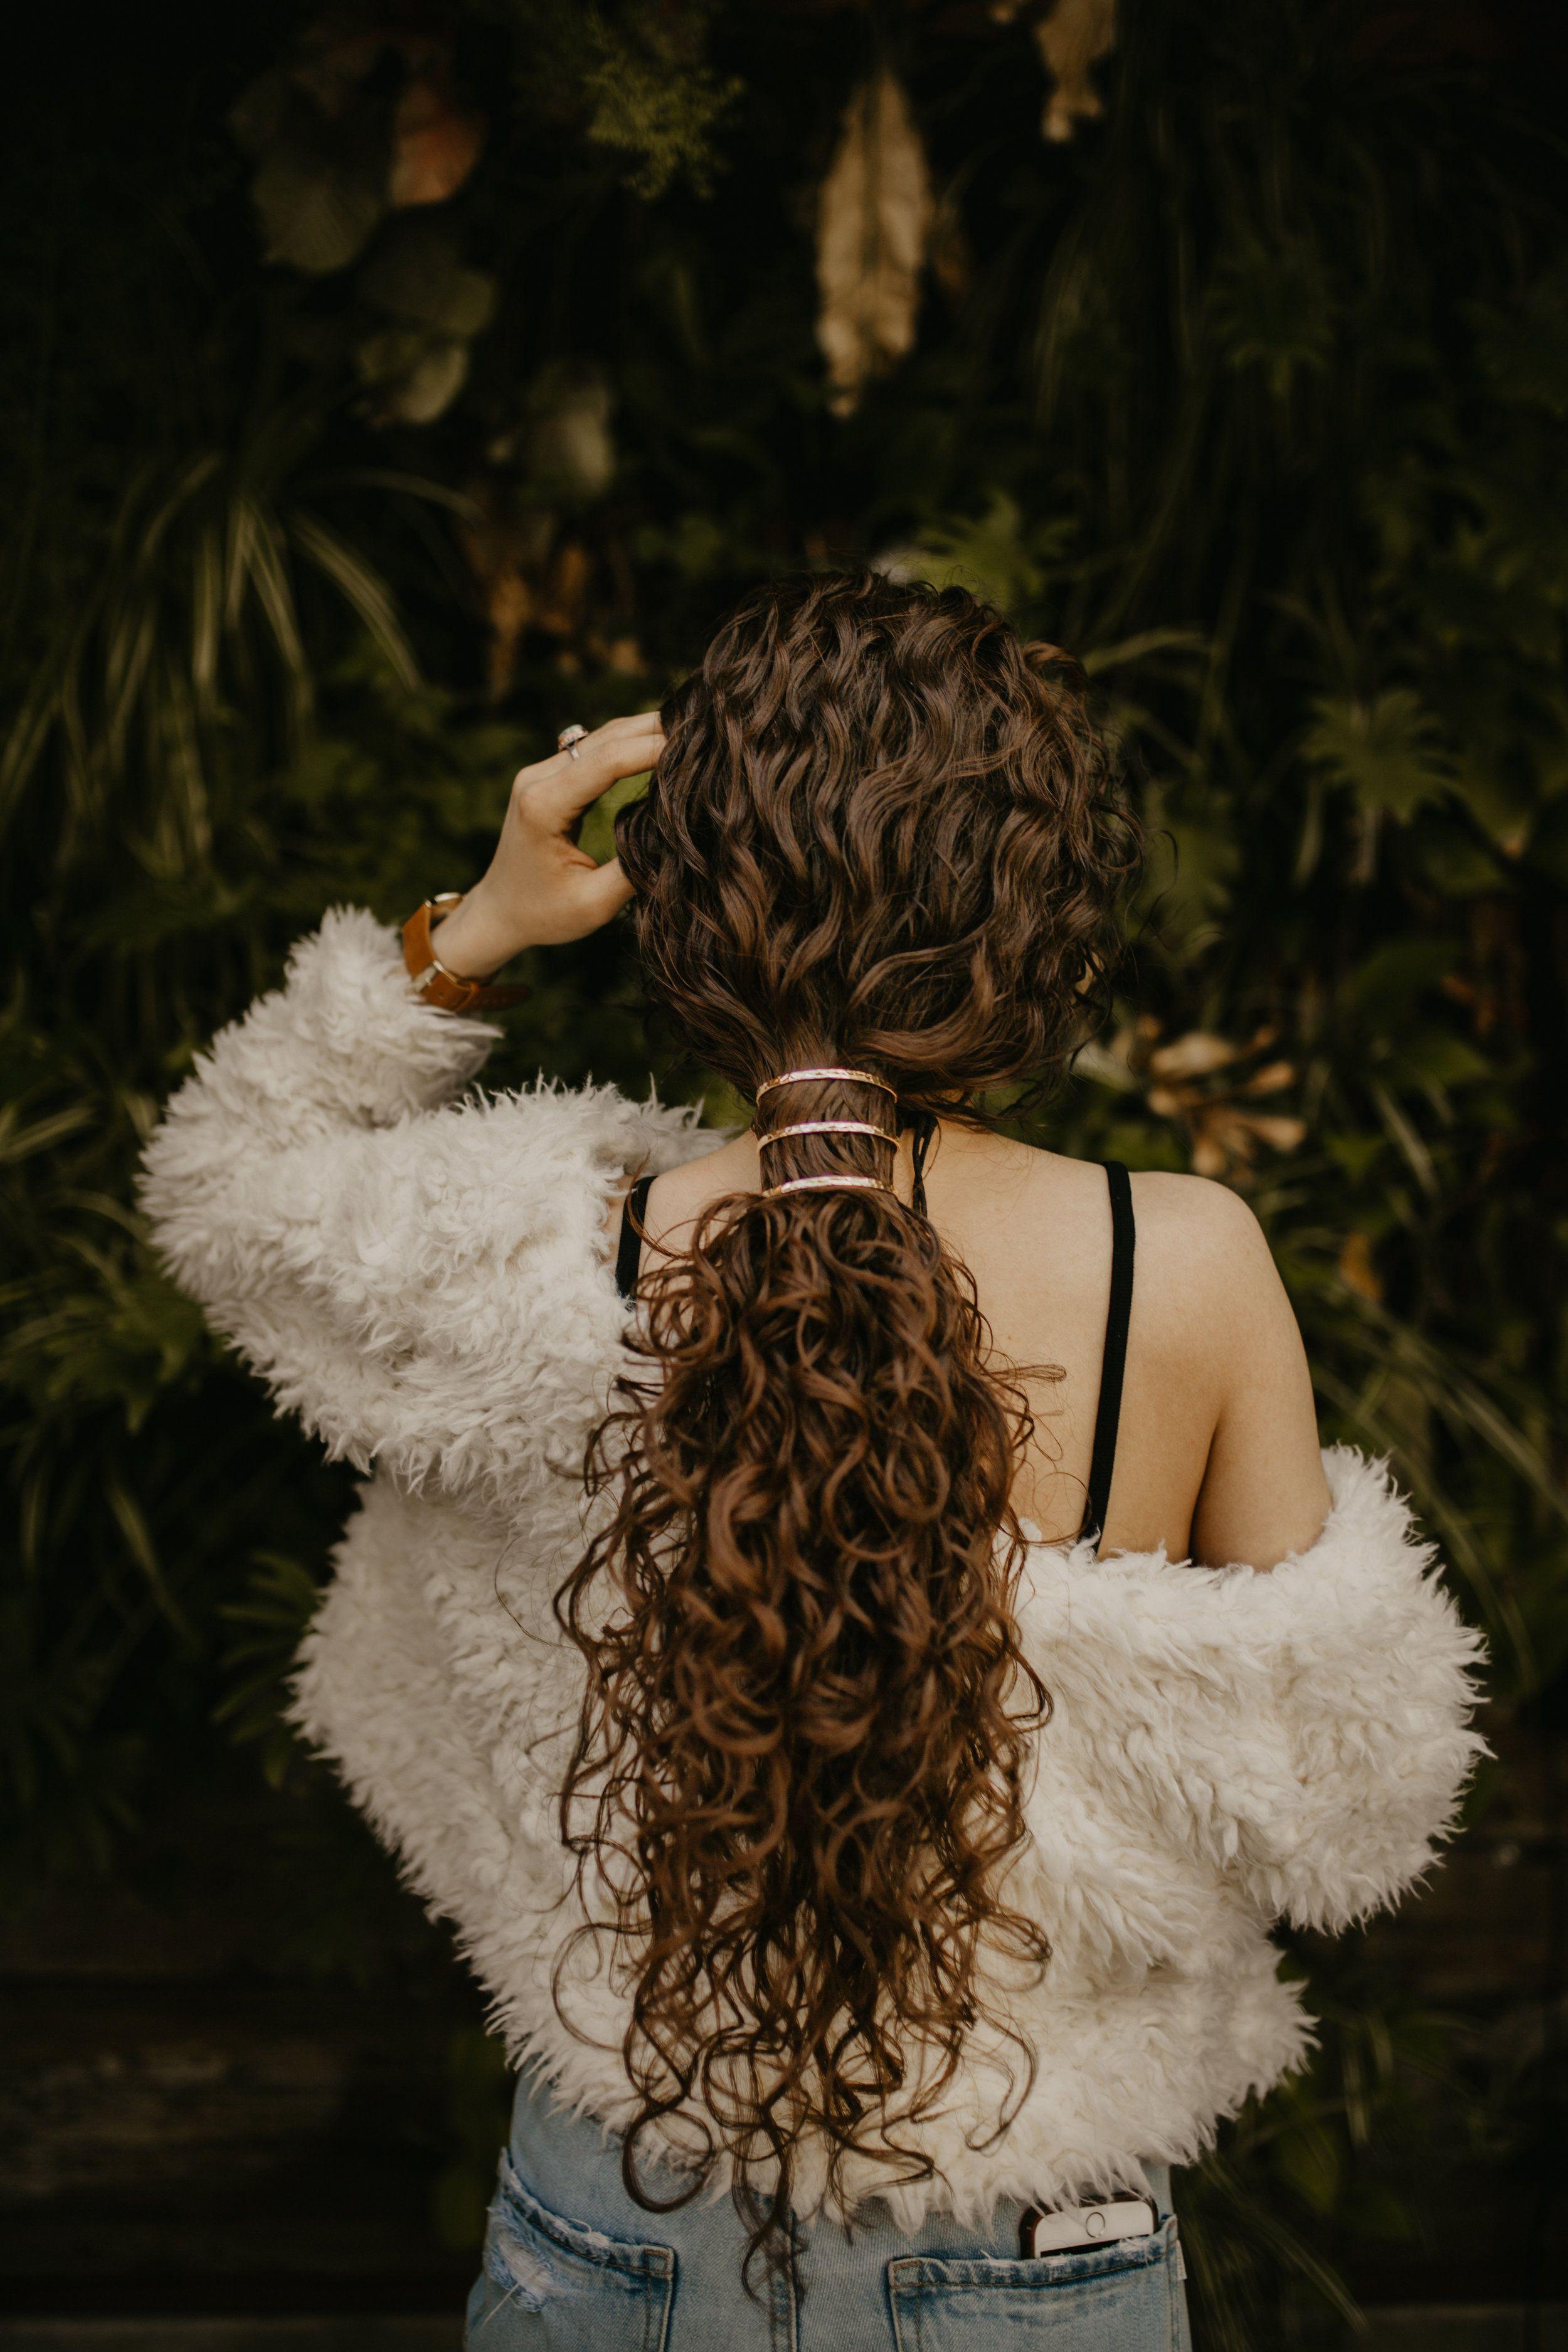 Curly Hair Salon Reno Tahoe Desert Curls Studio Curly Hair Accessories Curly Hair Styles Curly Hair Inspiration